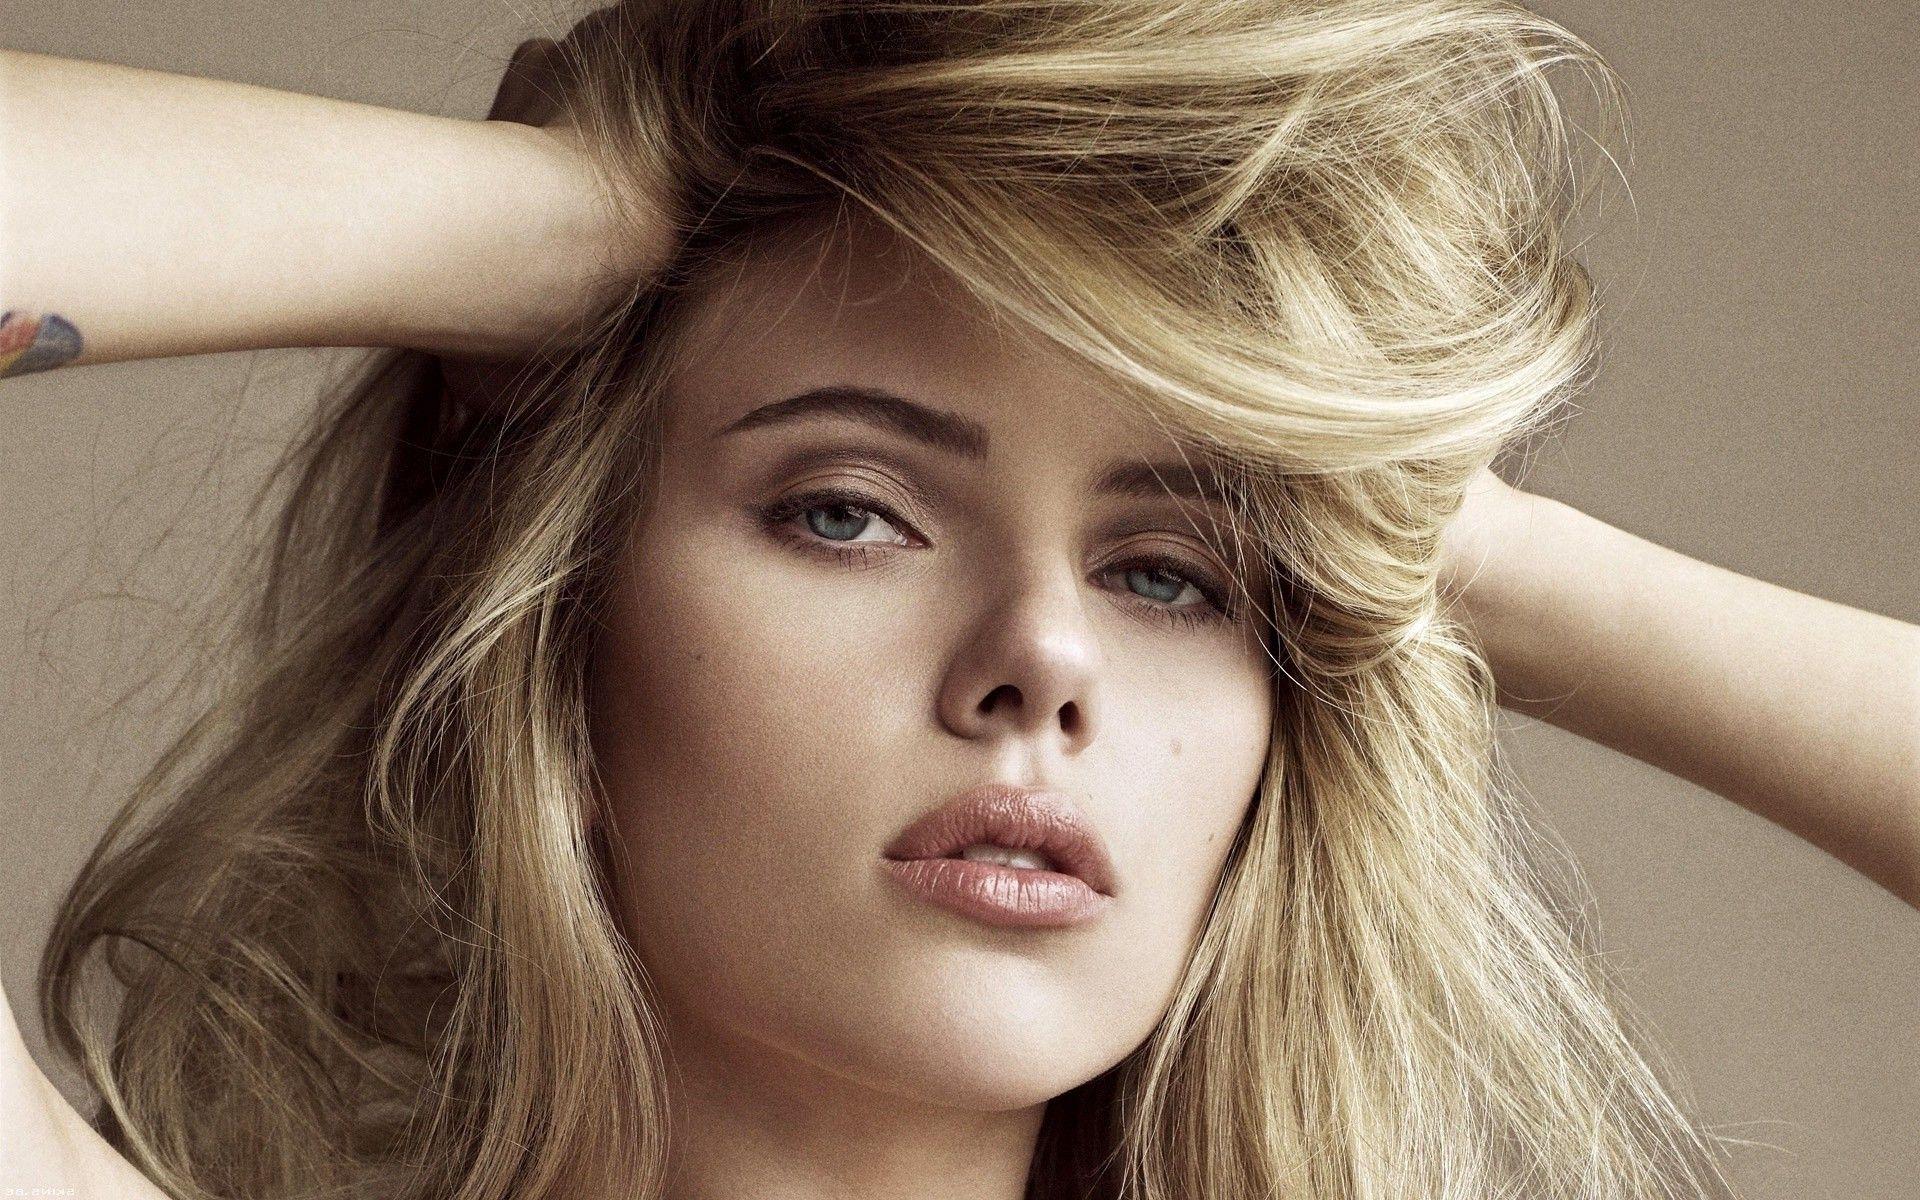 Scarlett Johansson 2017 Wallpapers - Wallpaper Cave